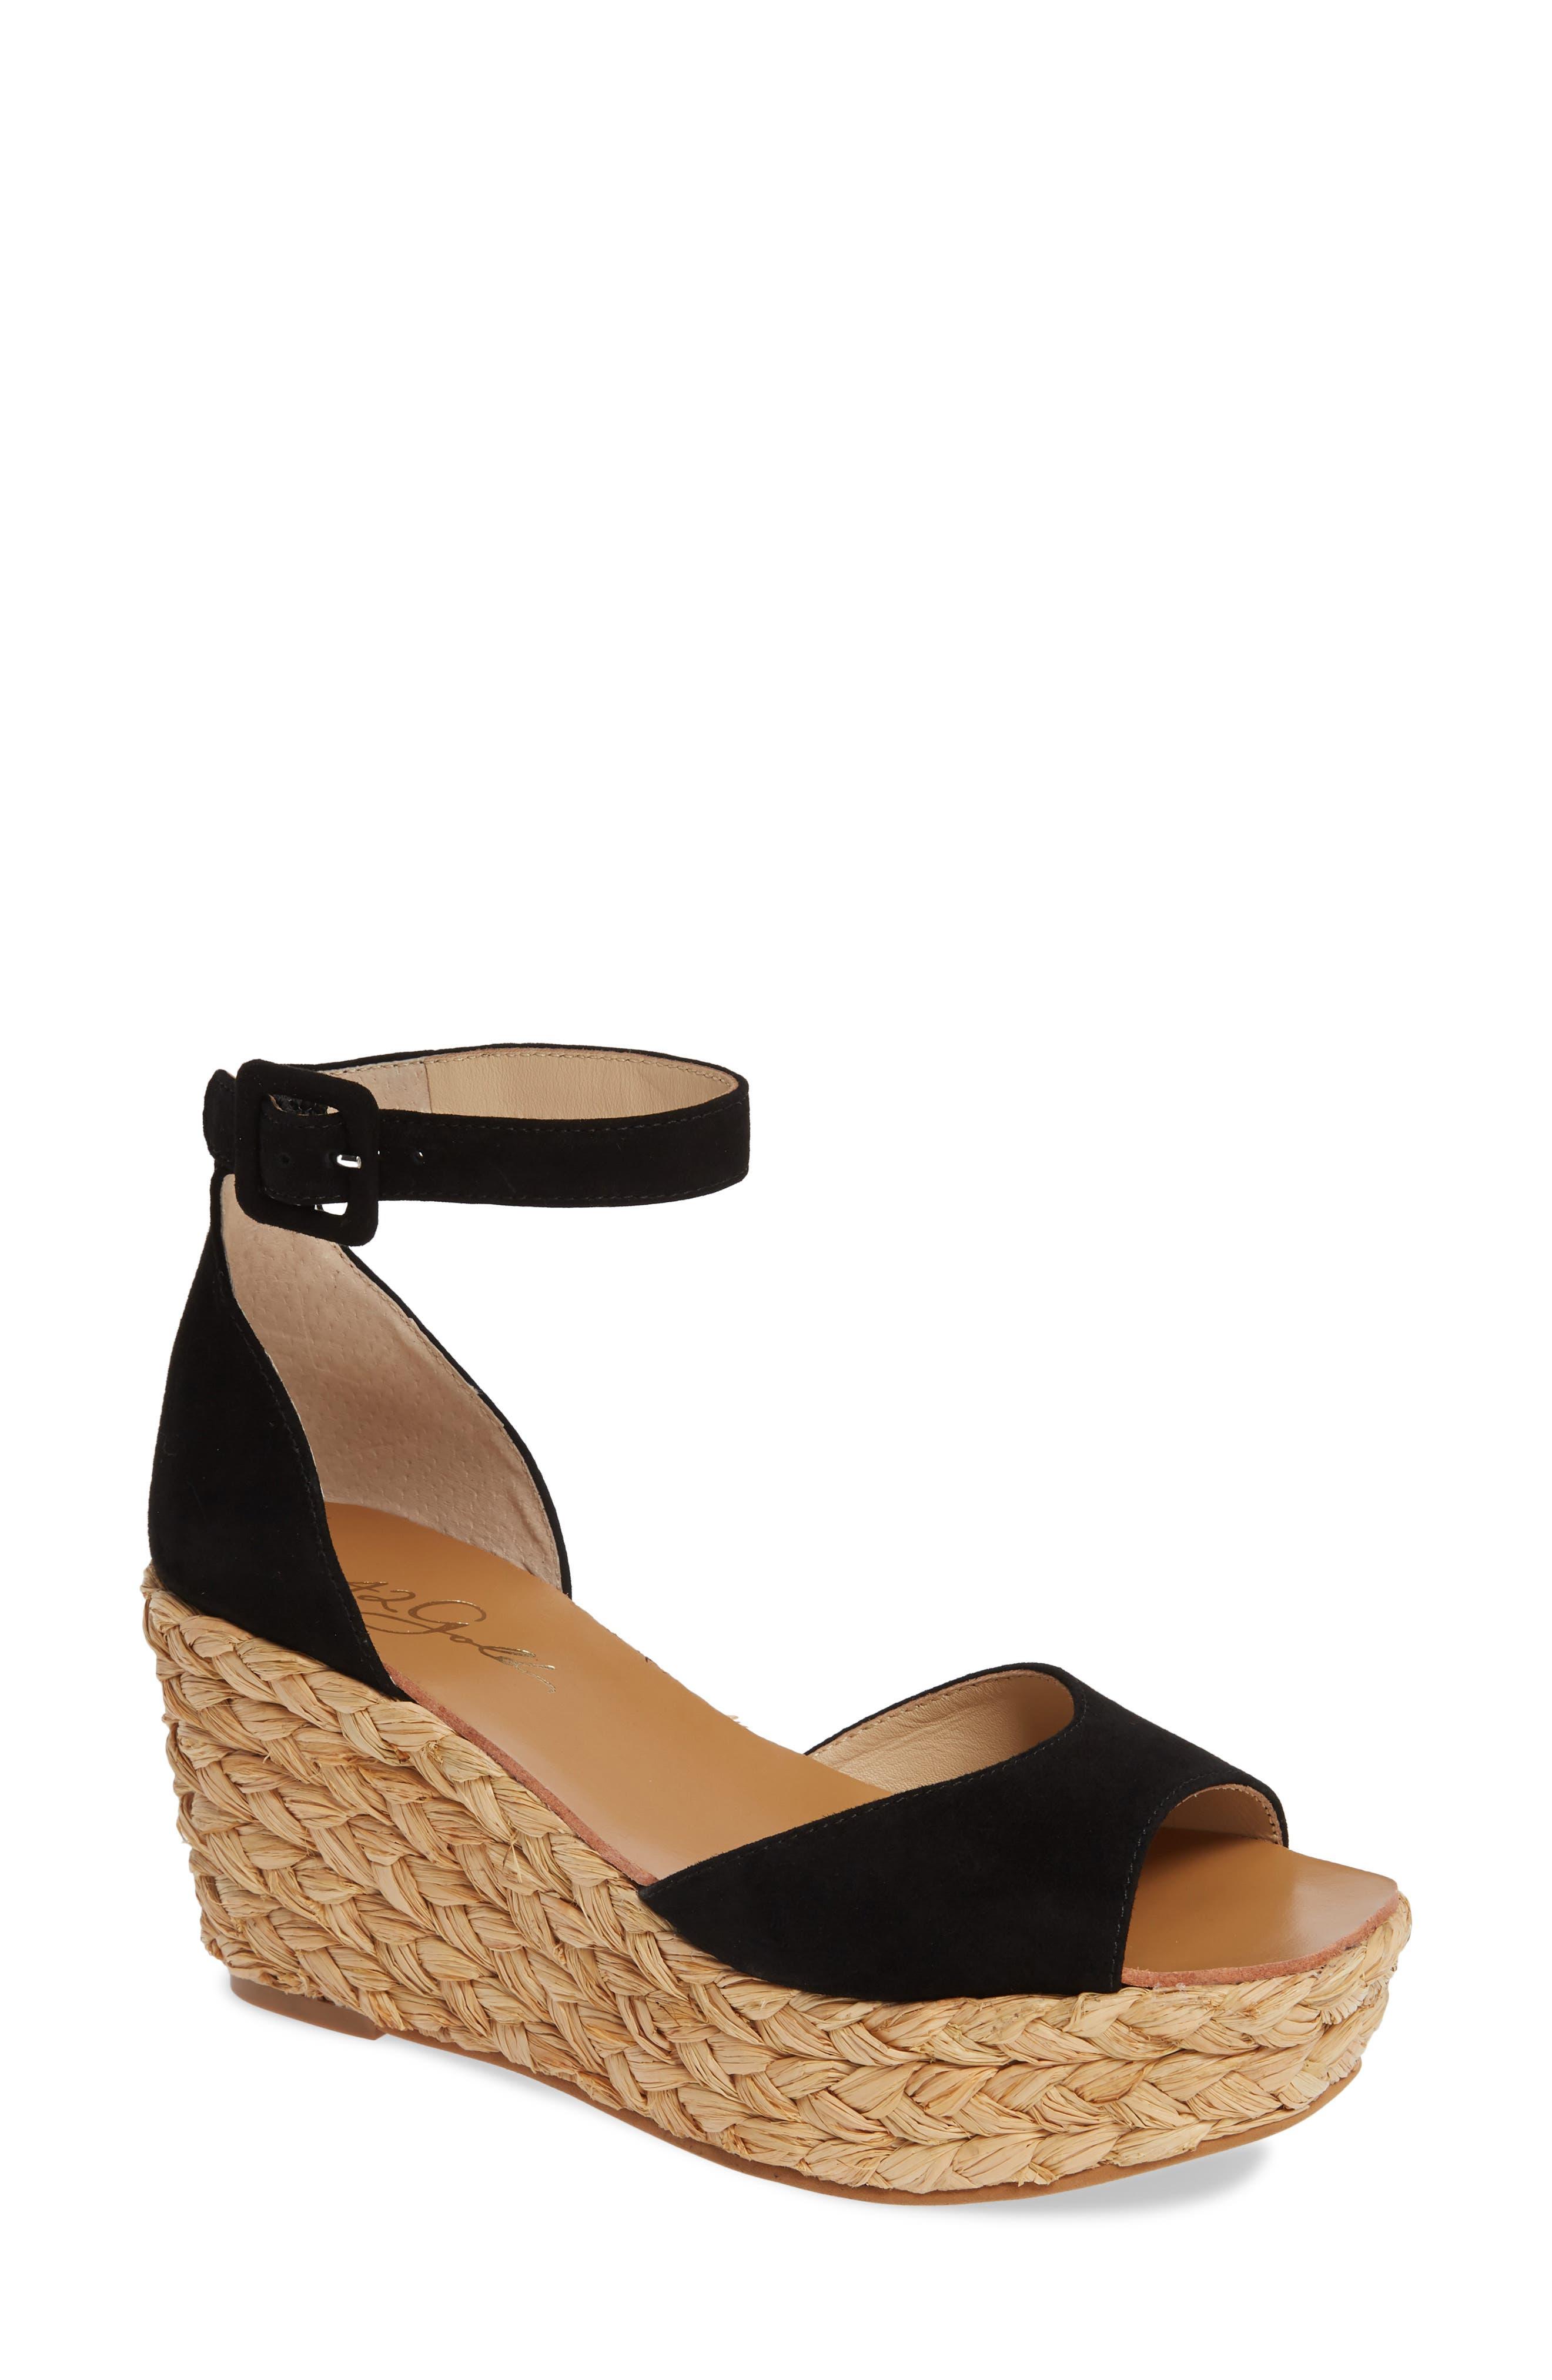 42 GOLD, Mindie Platform Wedge Sandal, Main thumbnail 1, color, BLACK SUEDE